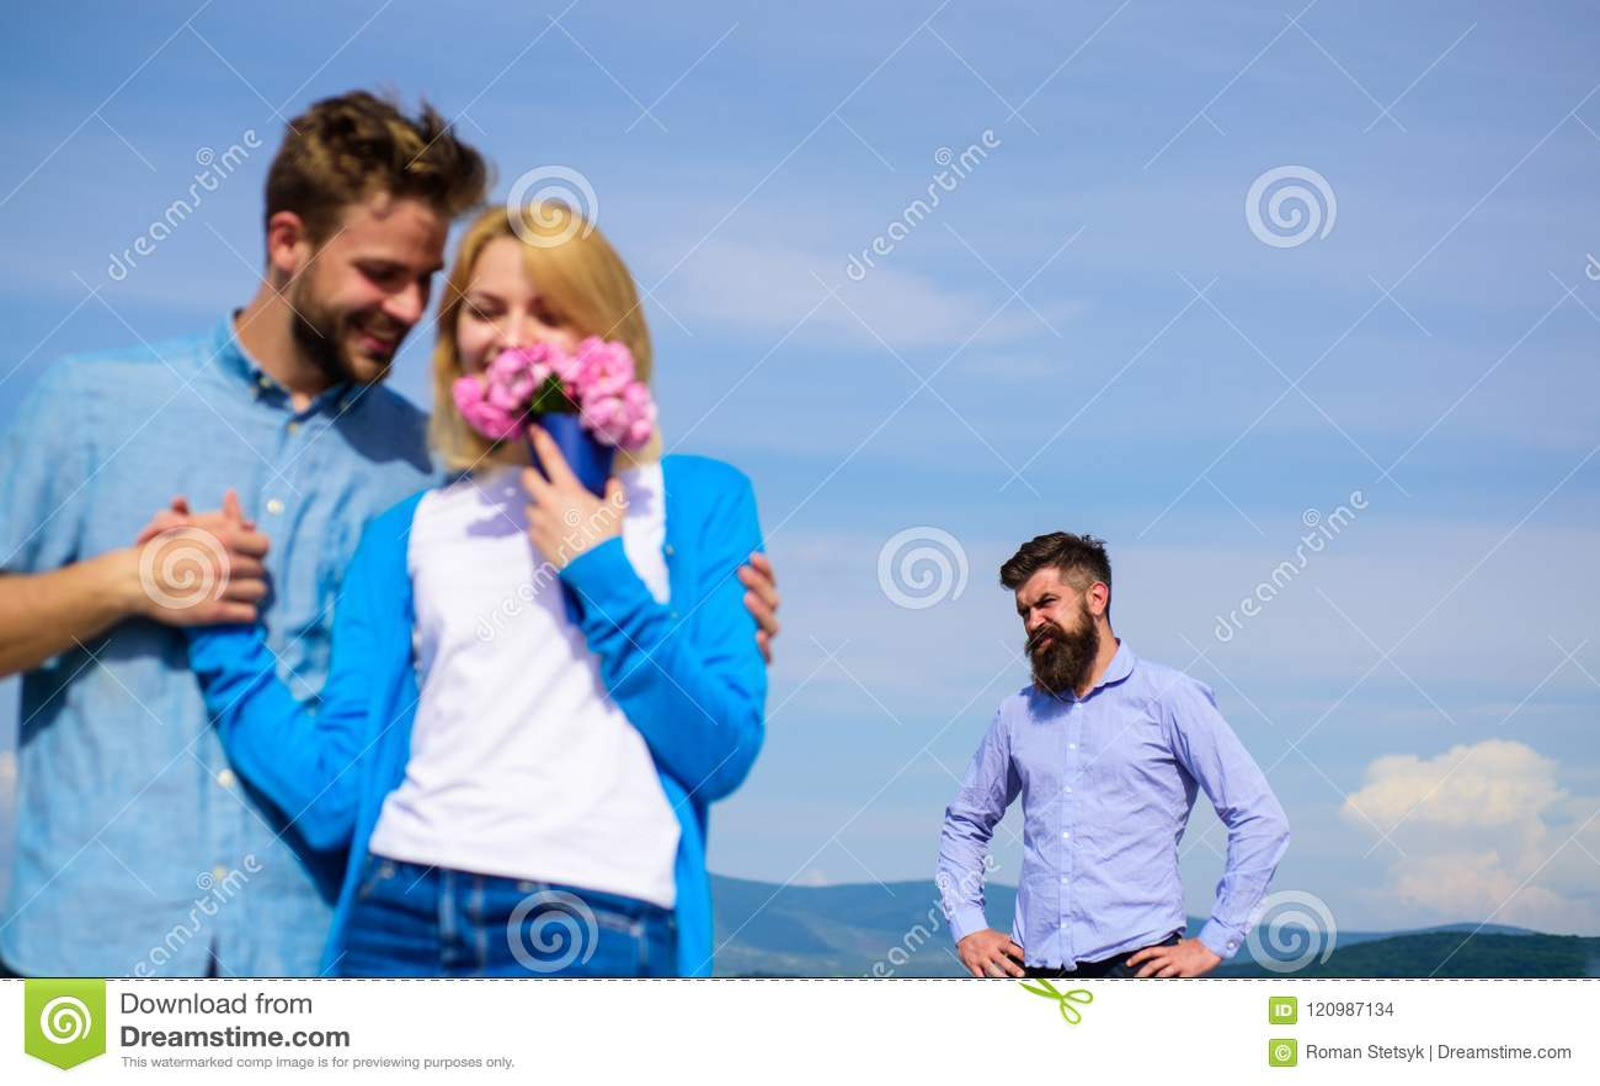 Outdoor girls dating